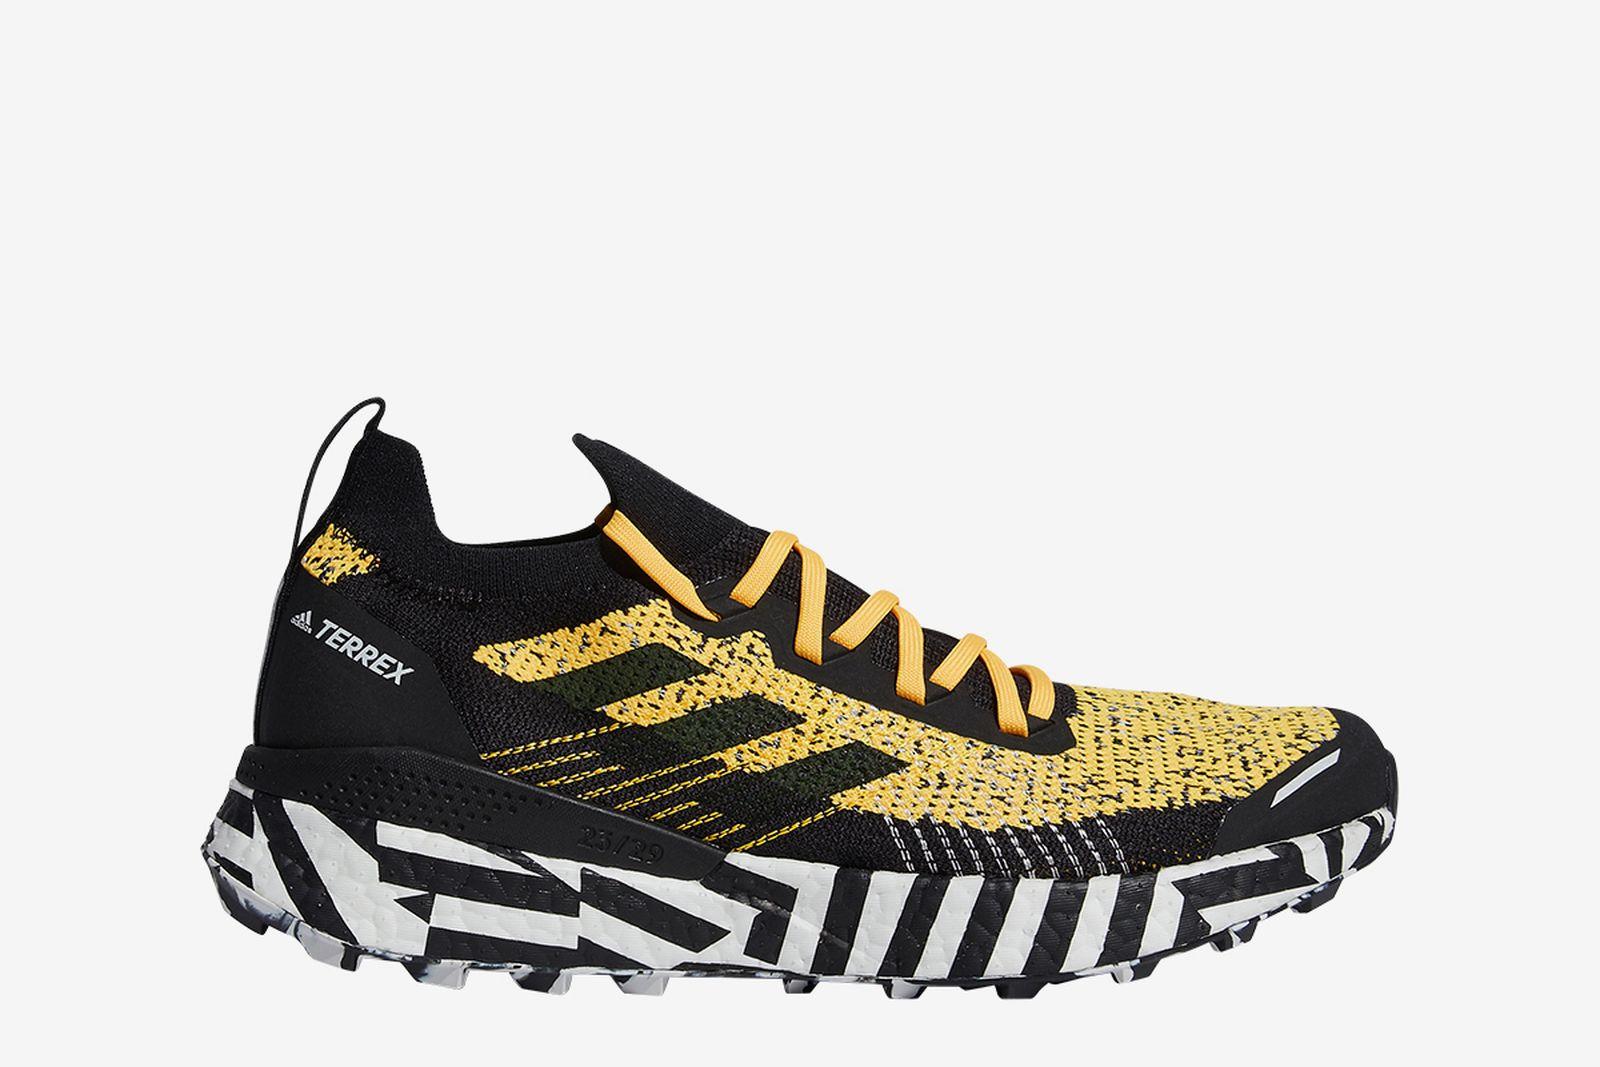 adidas-terrex-protohype-series-release-date-price-0-03